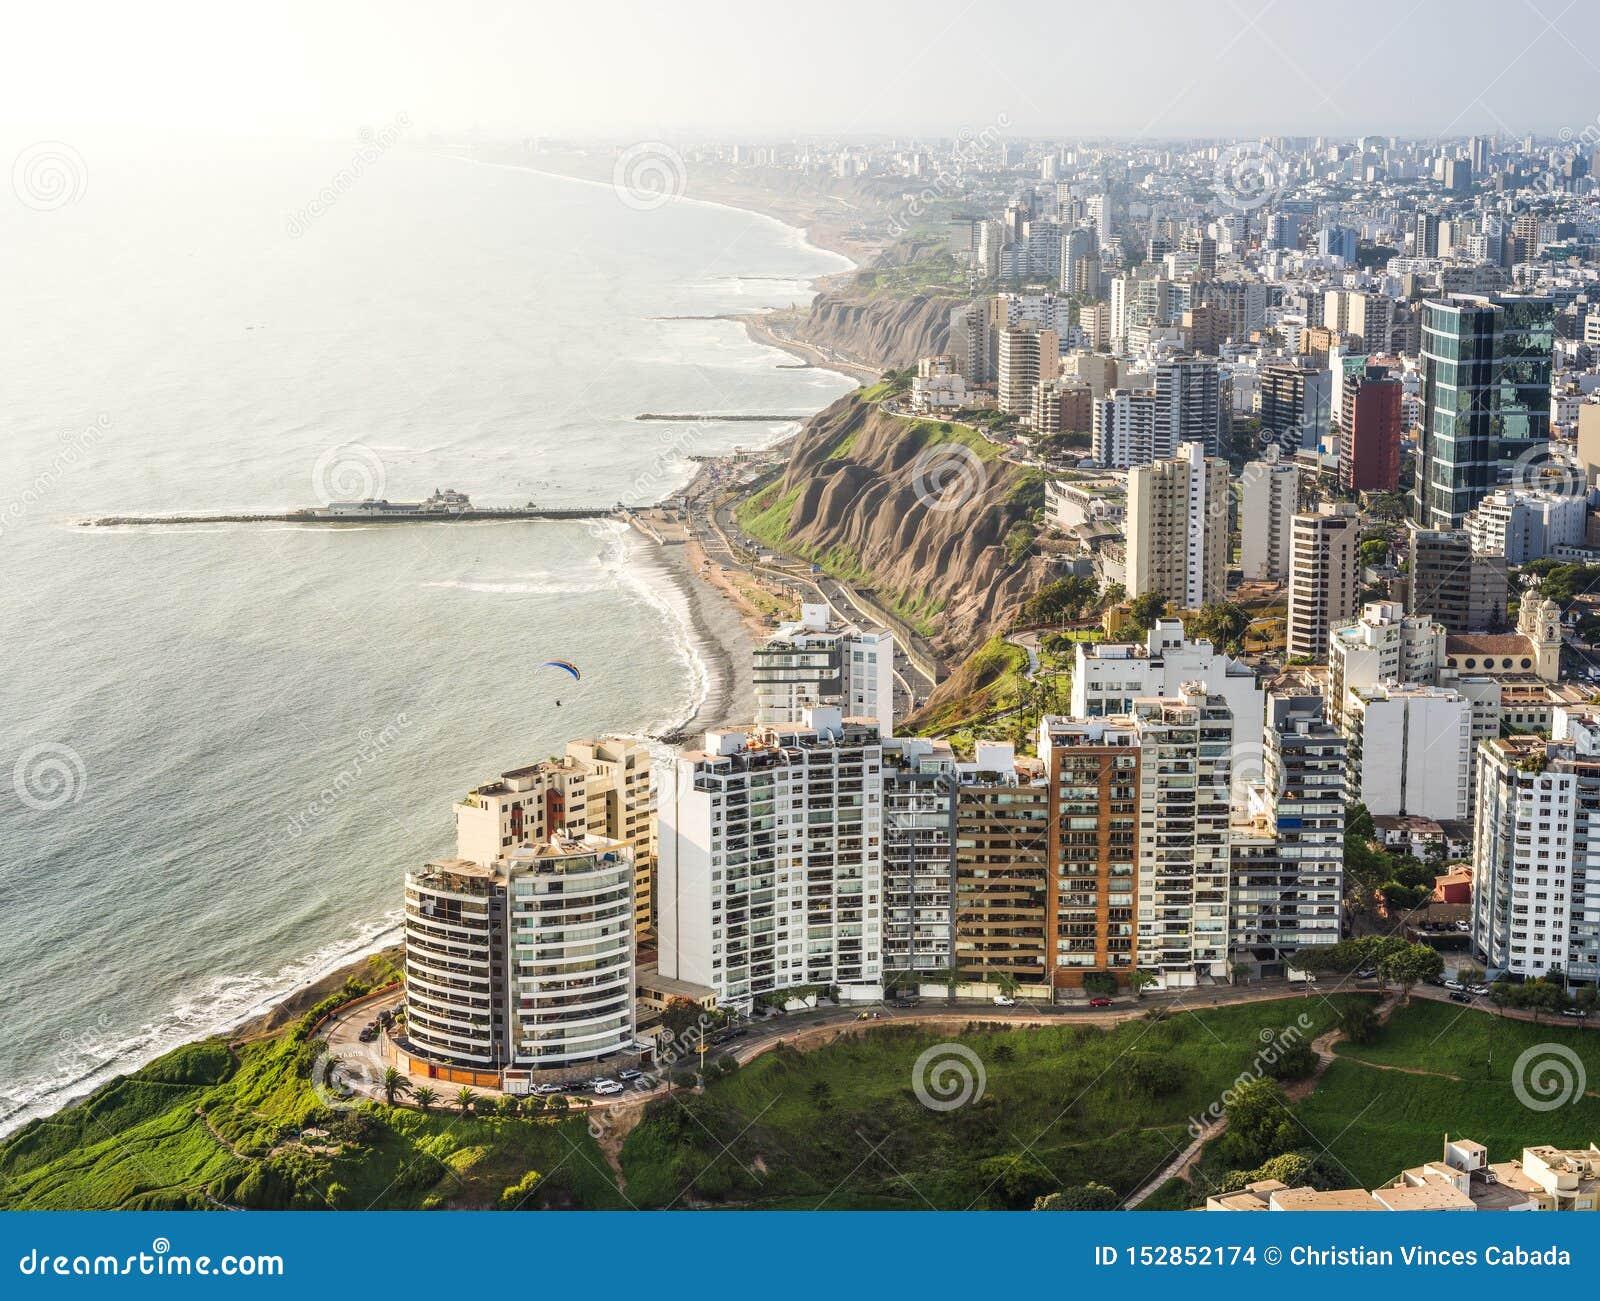 DRONE VIEW MIRAFLORES, LIMA, PERU